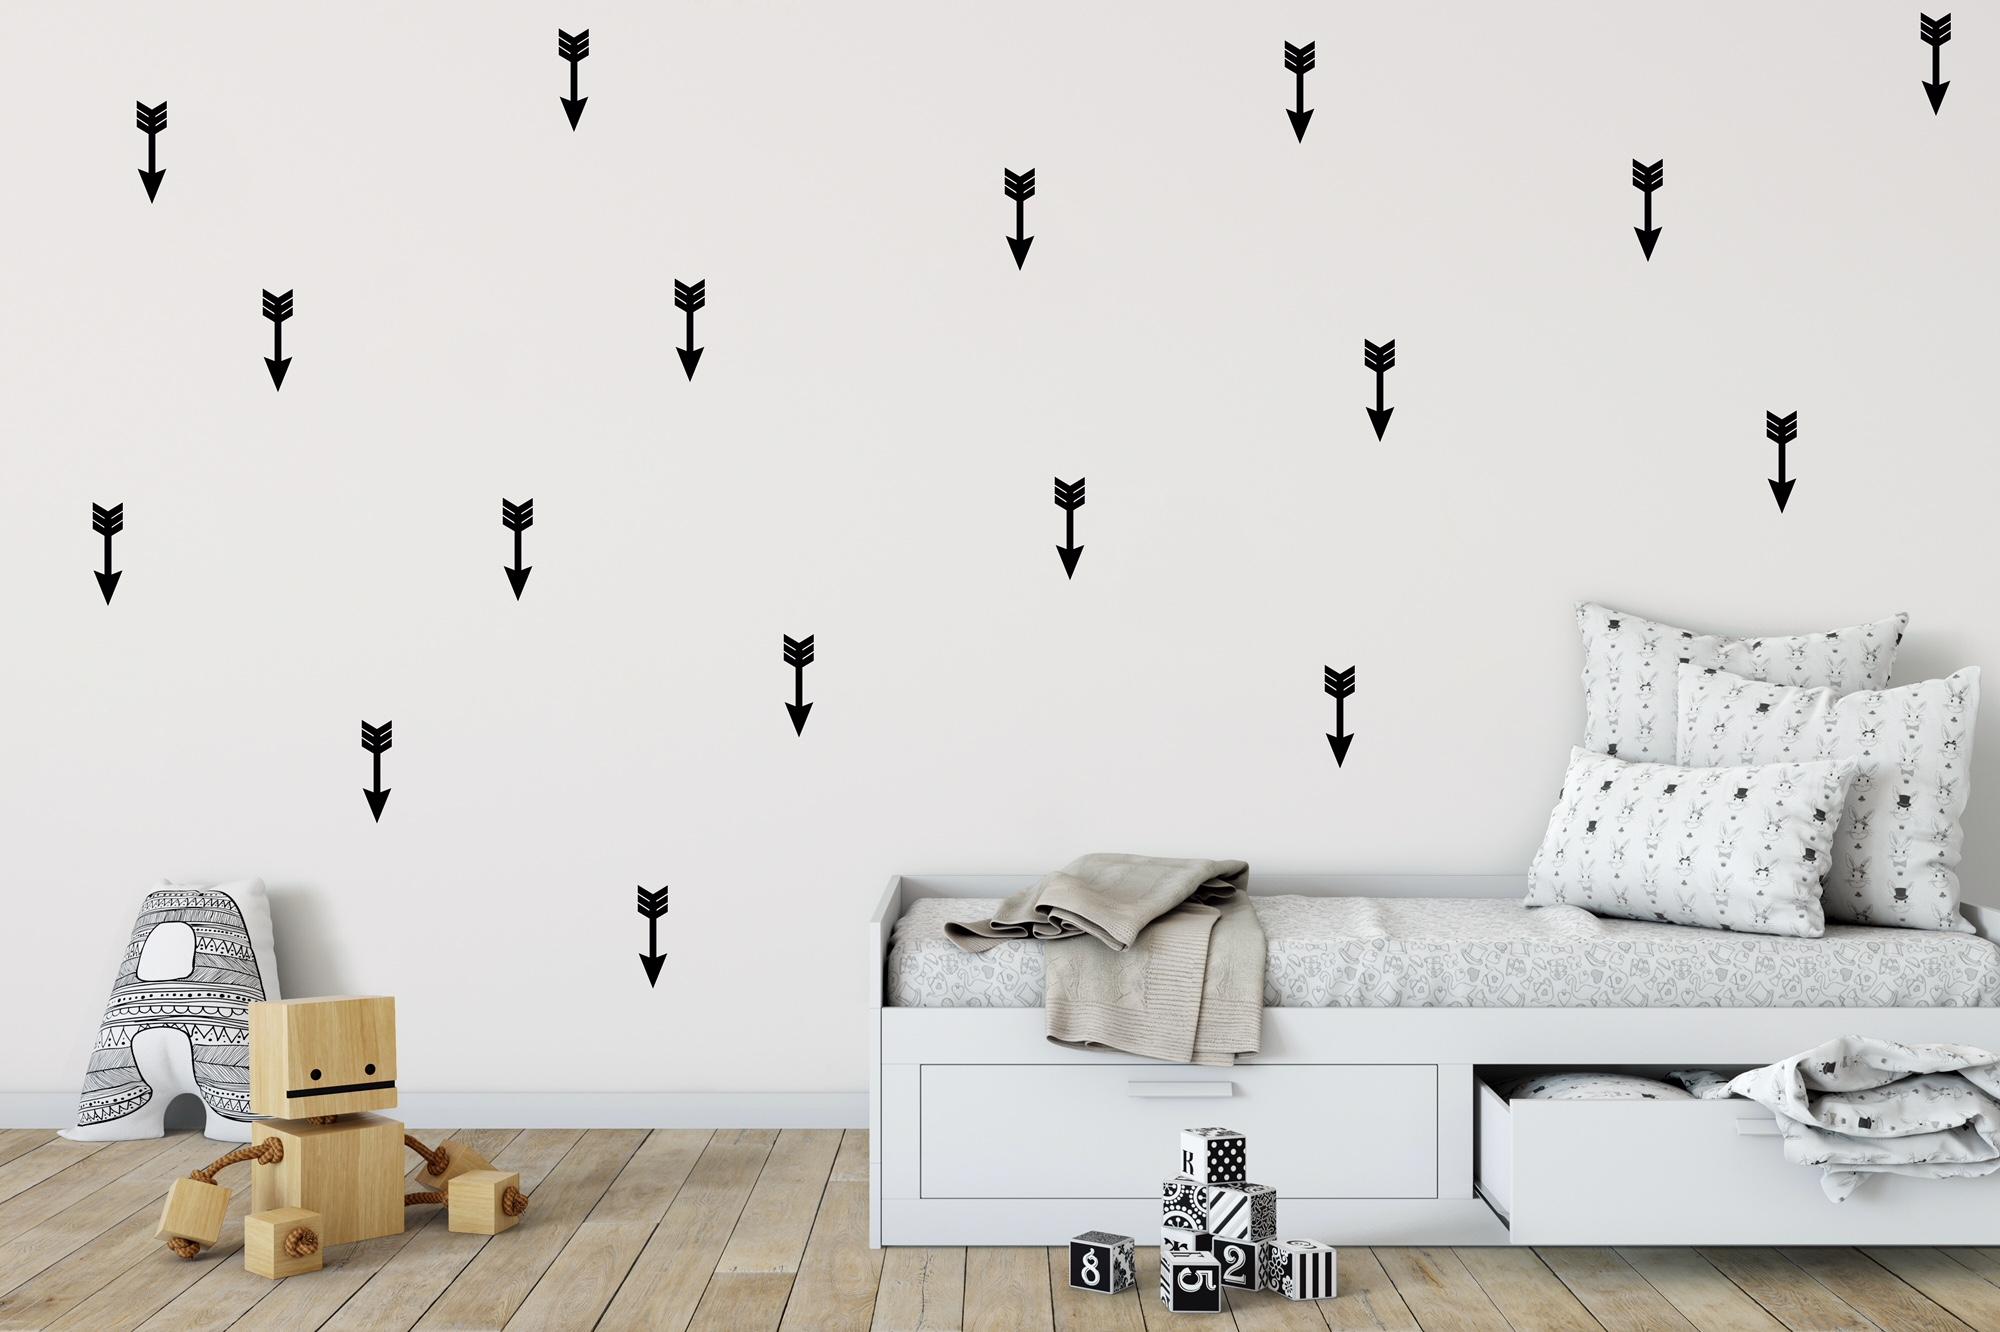 Little Love Wall Decals - Arrows